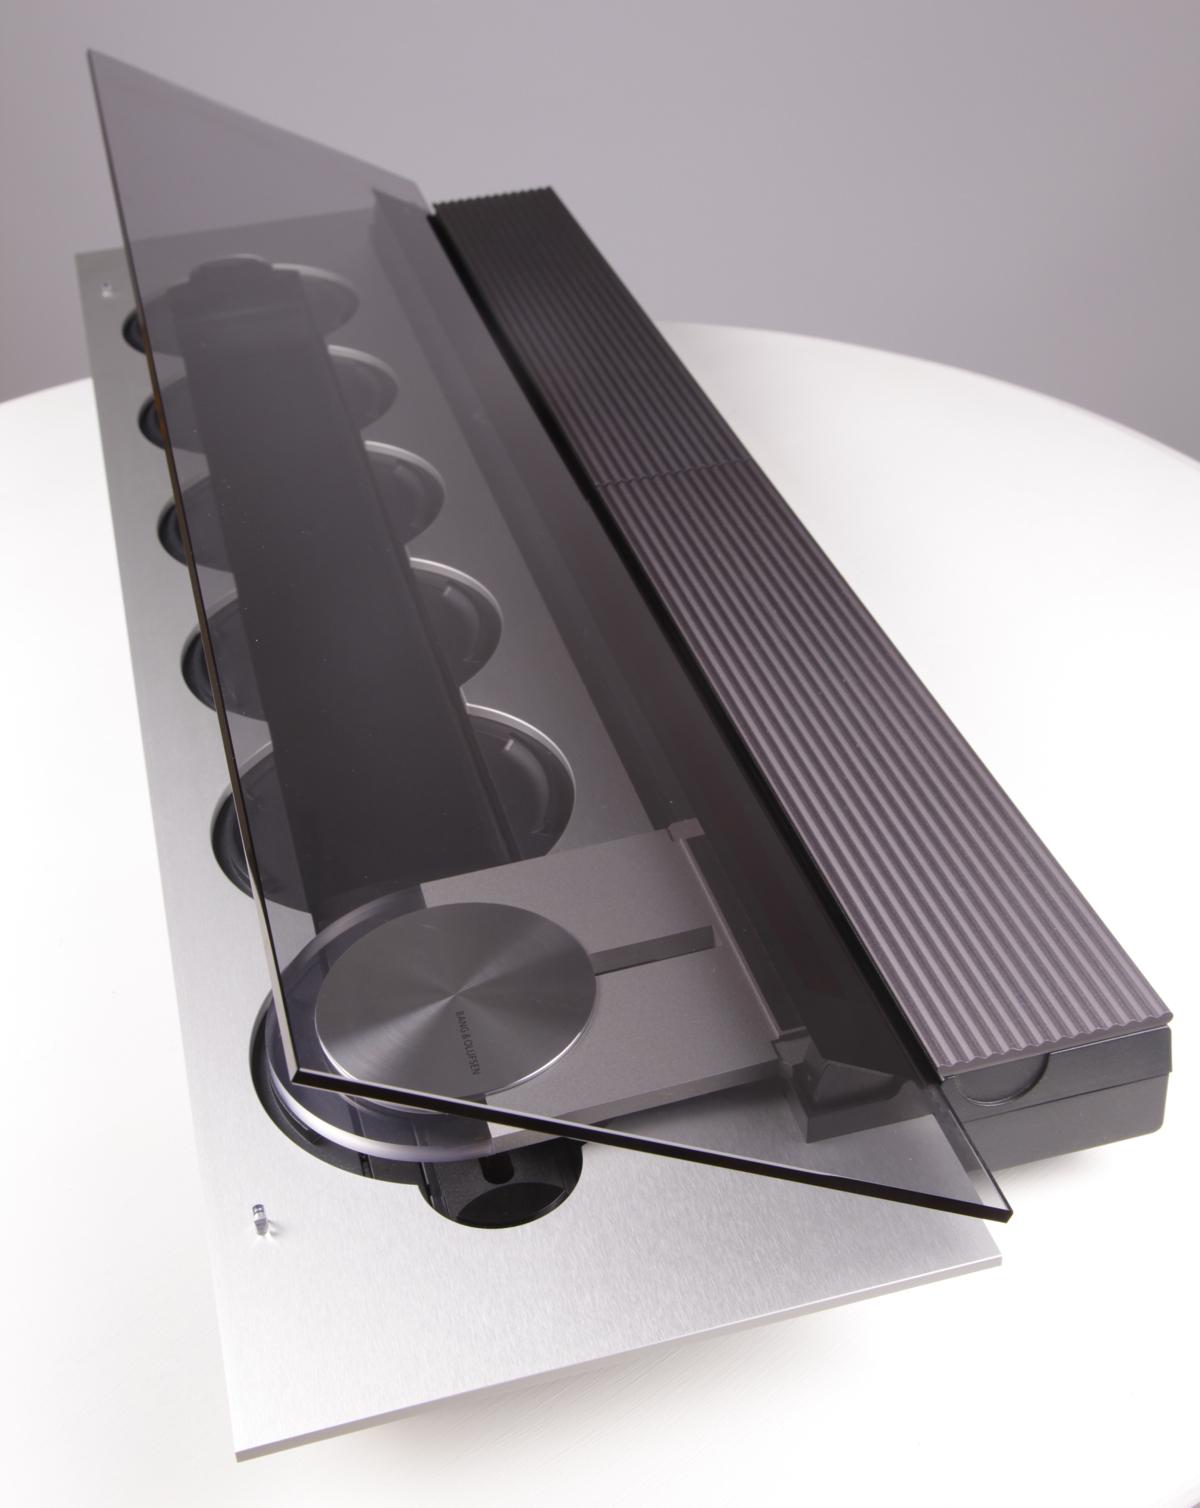 bang-olufsen-6-cd-changer